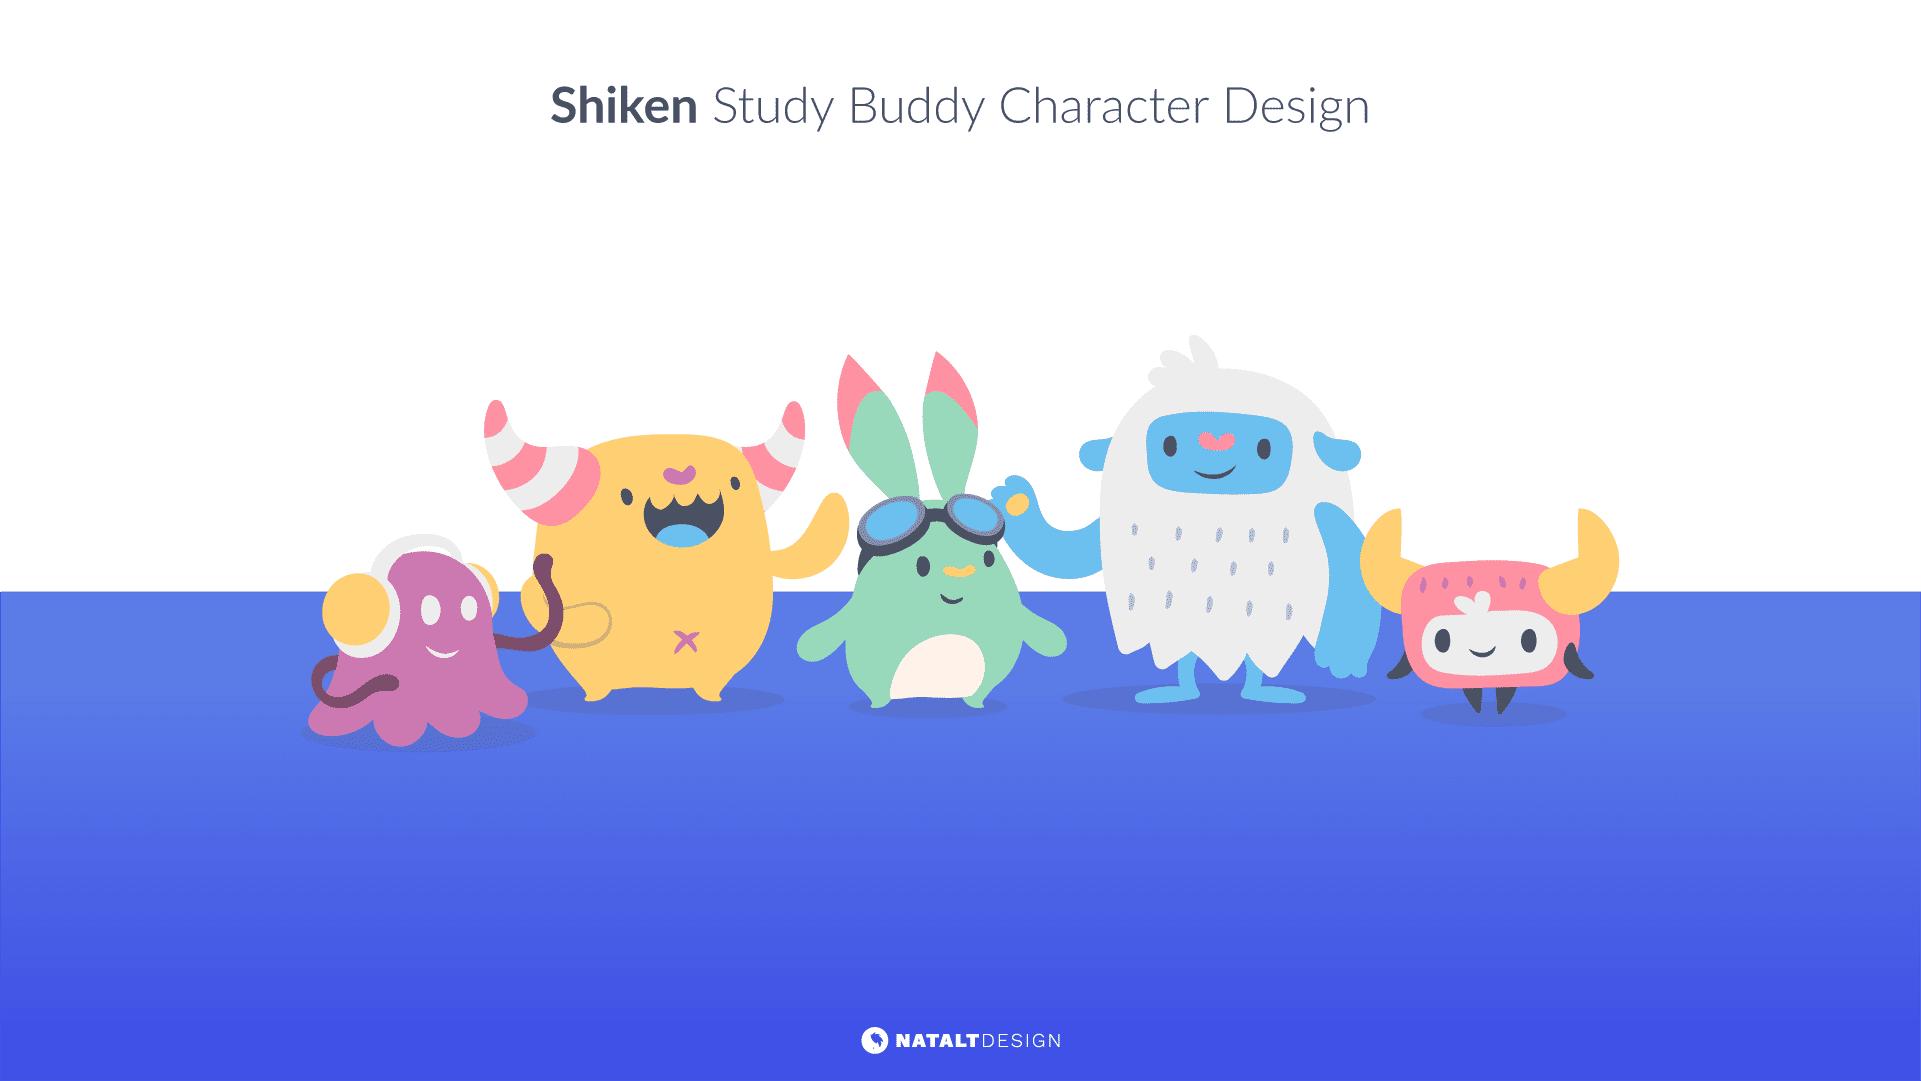 Shiken study buddy character design